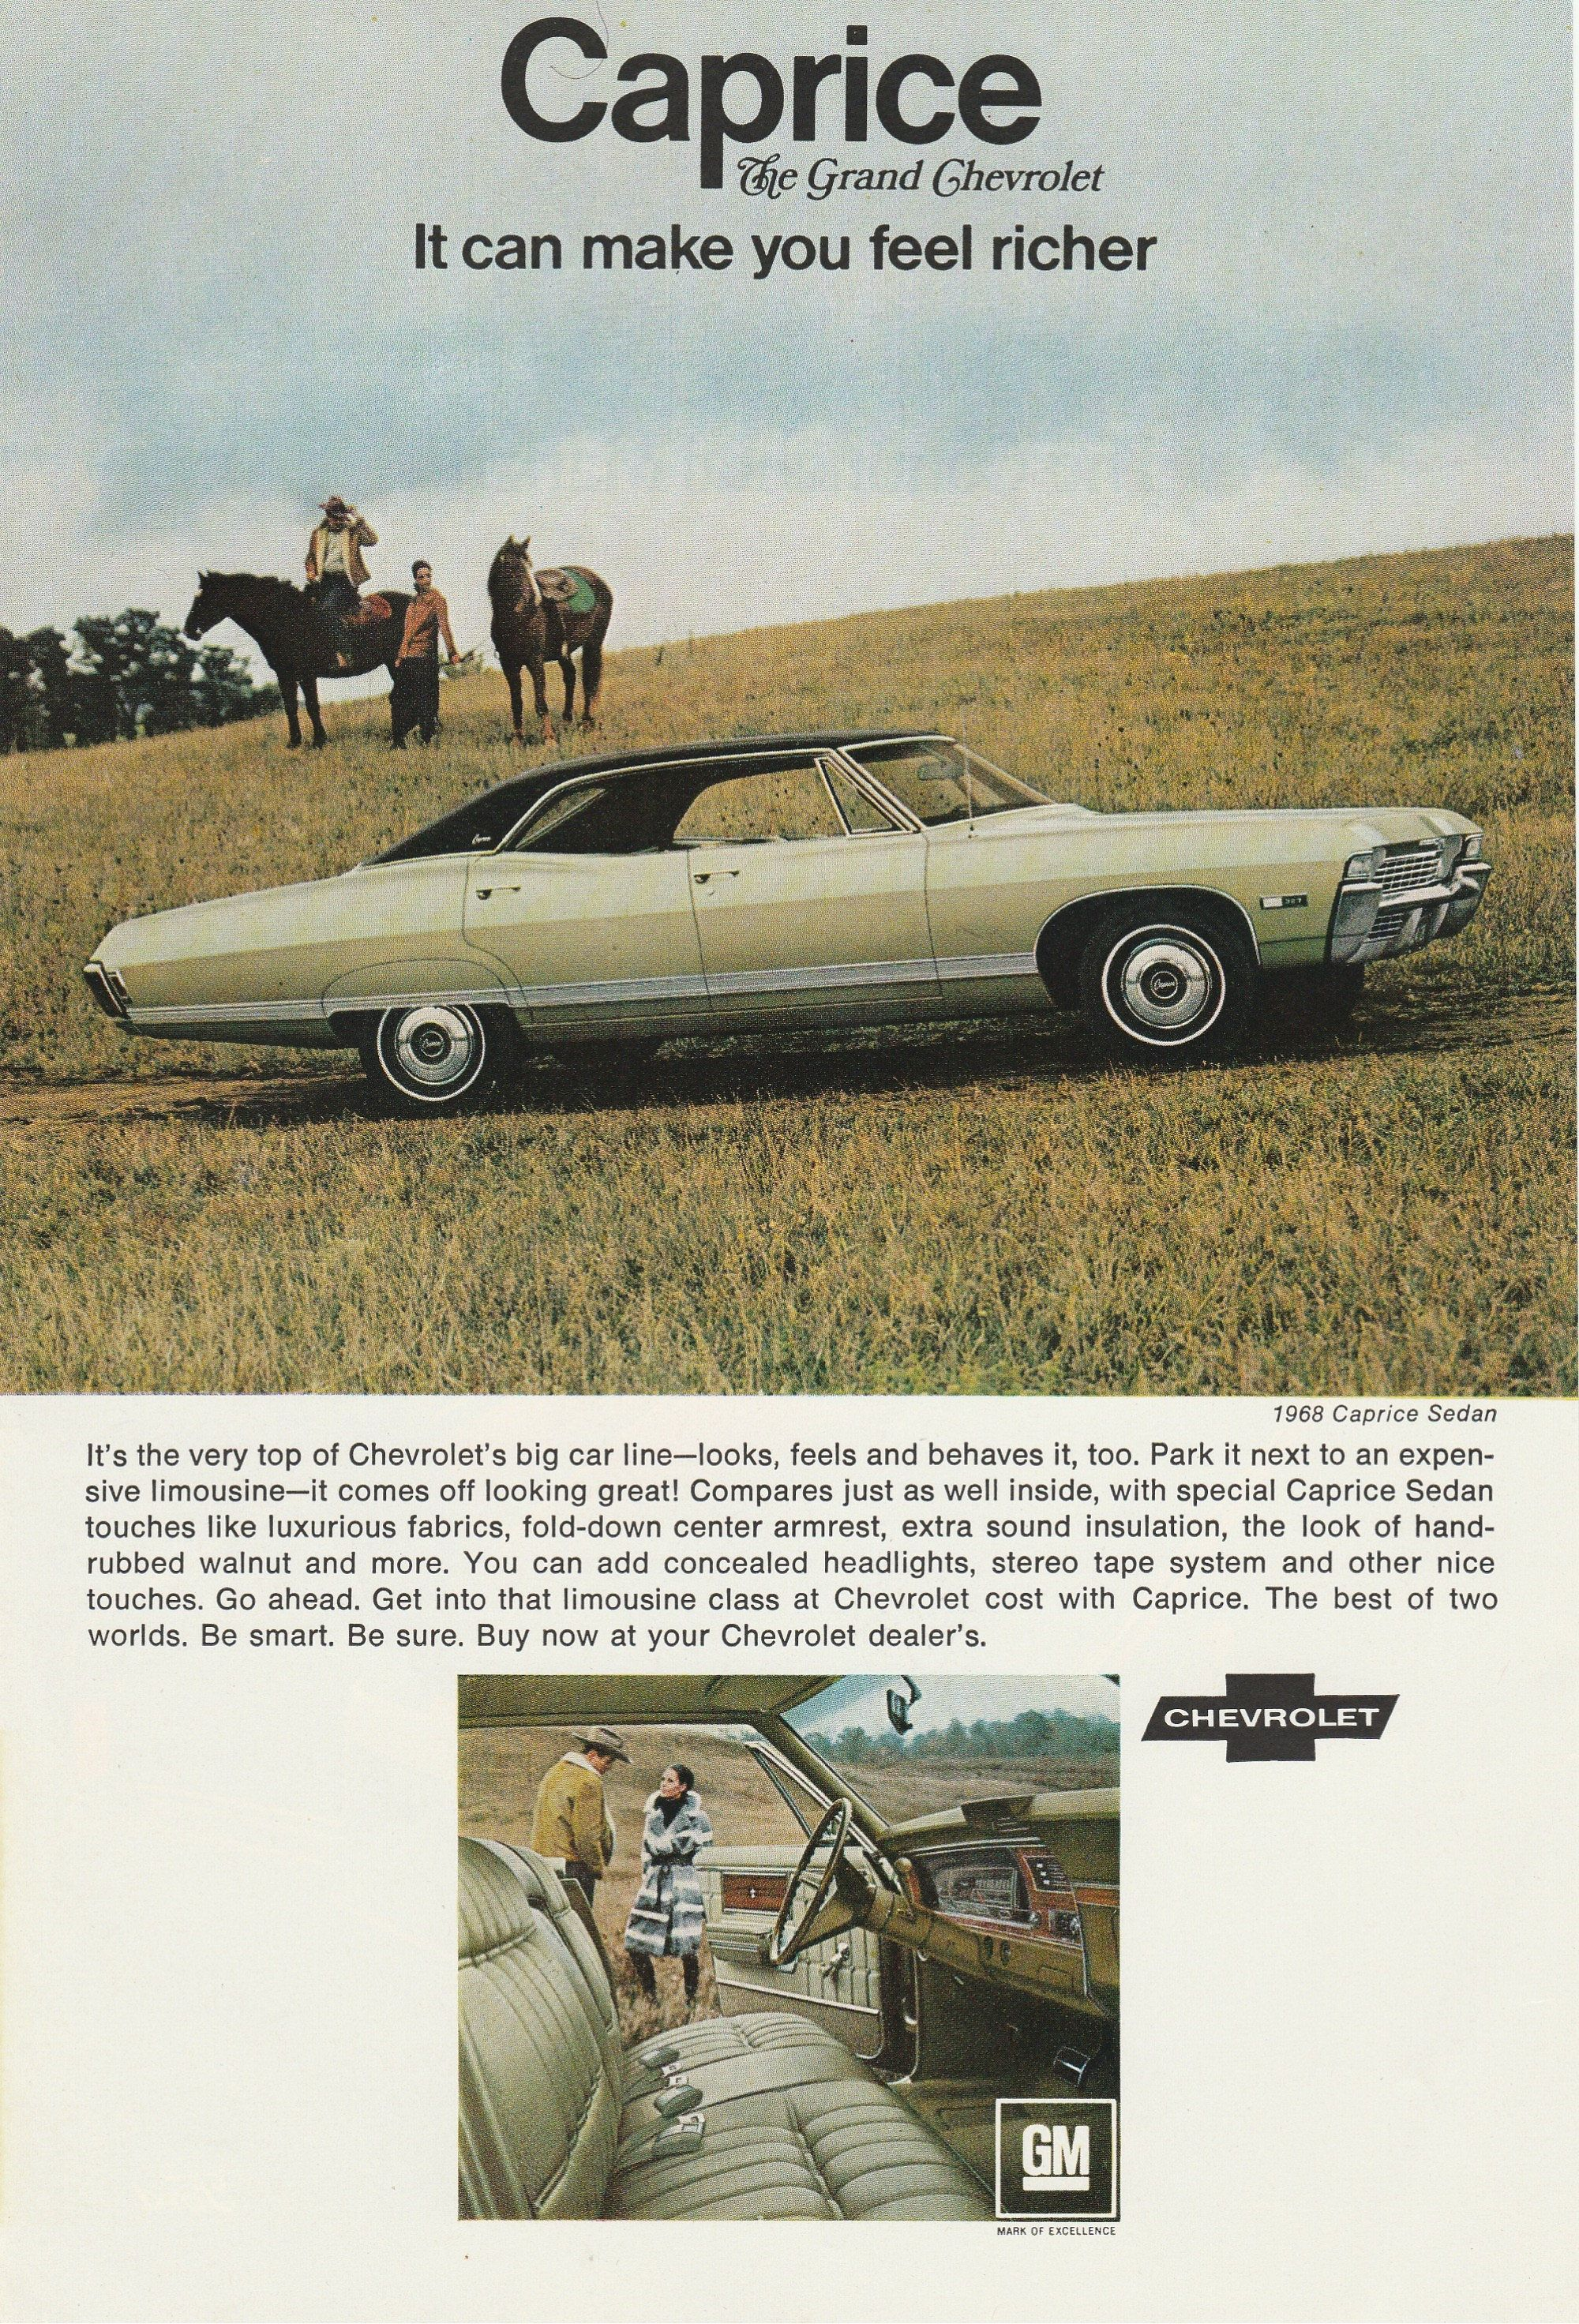 1968 Chevy Caprice Sedan Vintage Magazine Advertisement